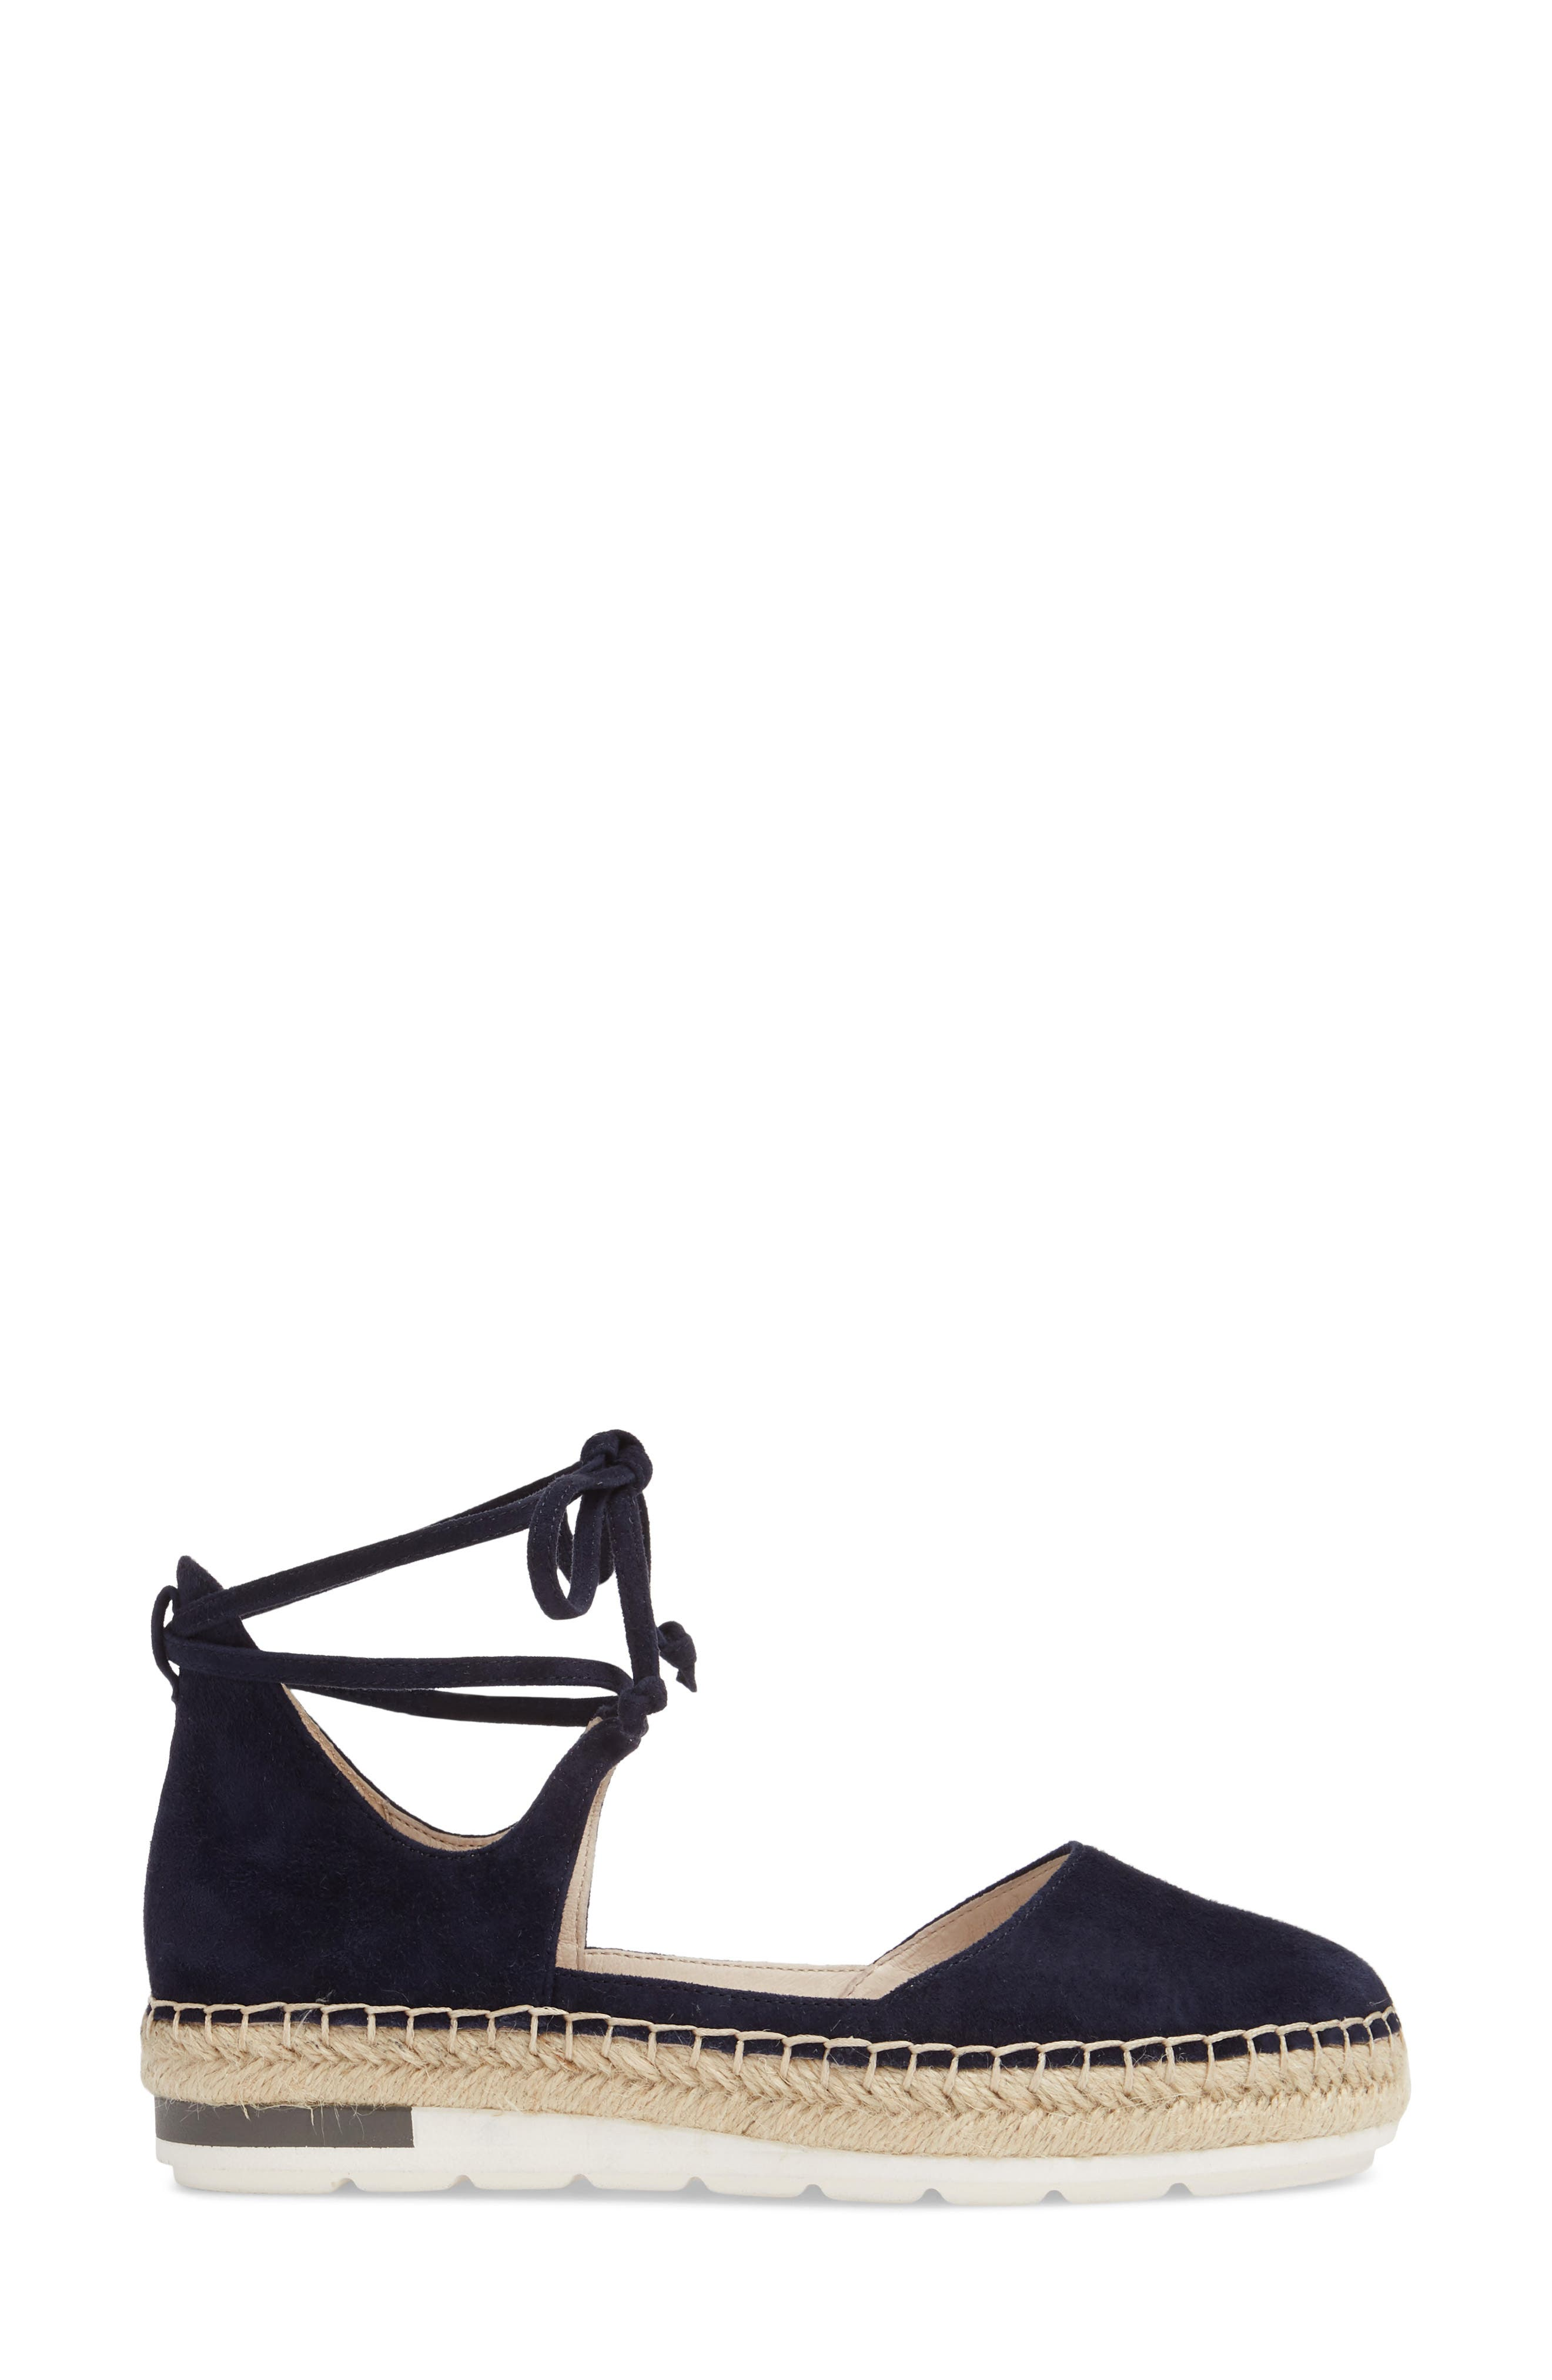 Leena Ankle Strap Sandal,                             Alternate thumbnail 3, color,                             Navy Suede